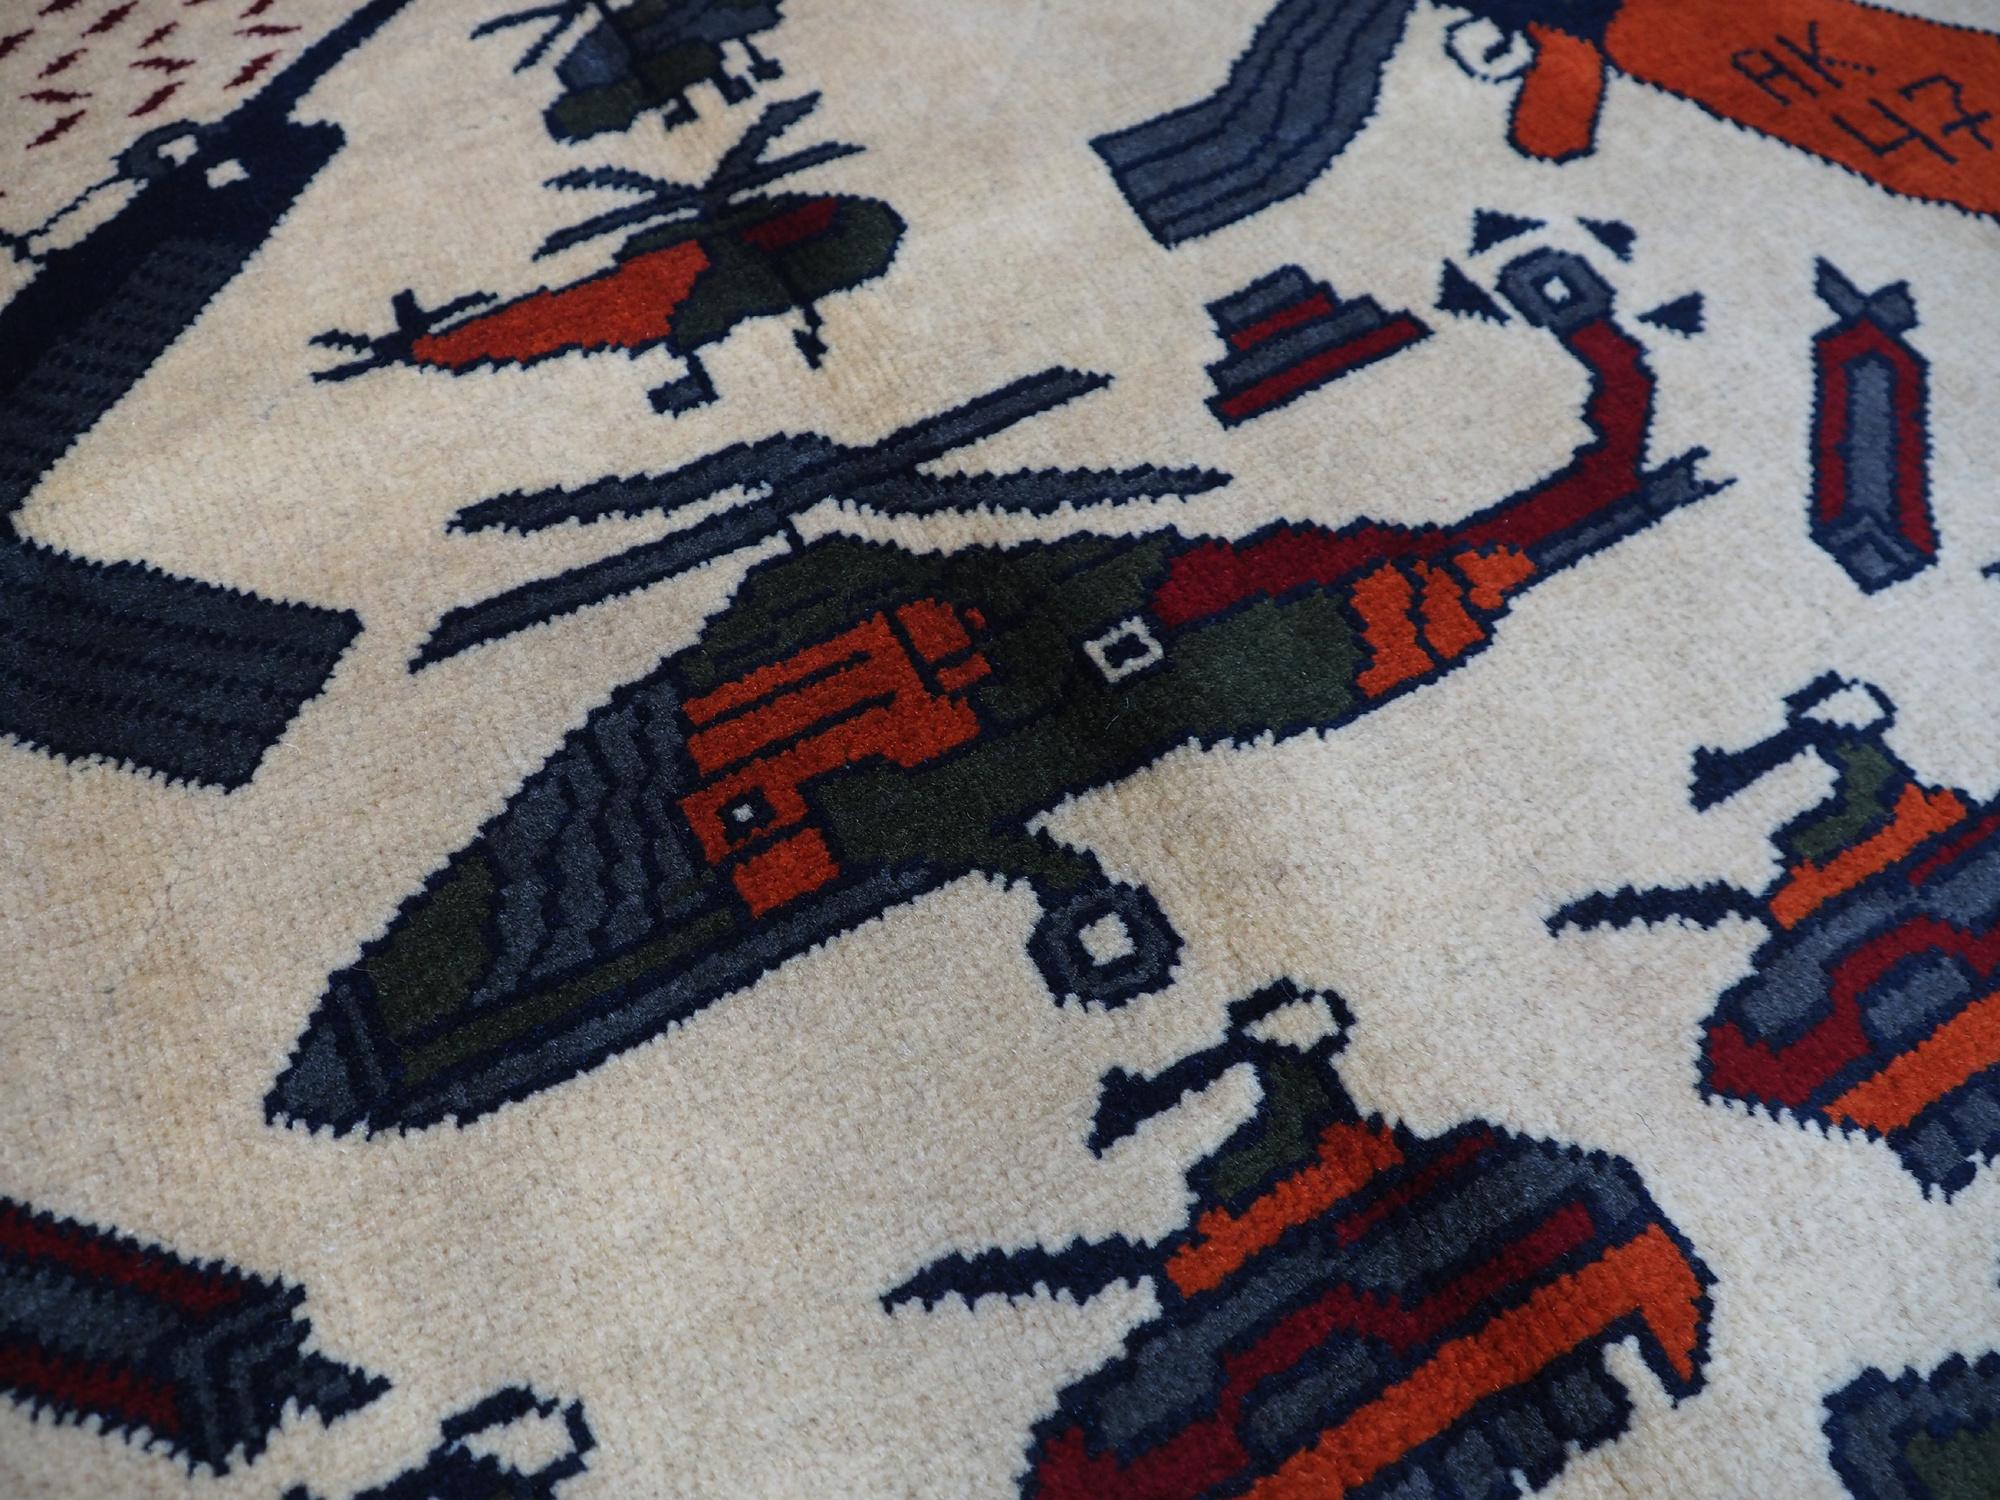 Afghan Kriegteppich Handgeknüpf Teppich Afghanistan panzer kampfjet gewehr USA Army Nato ISAF war rug Nr:19/12